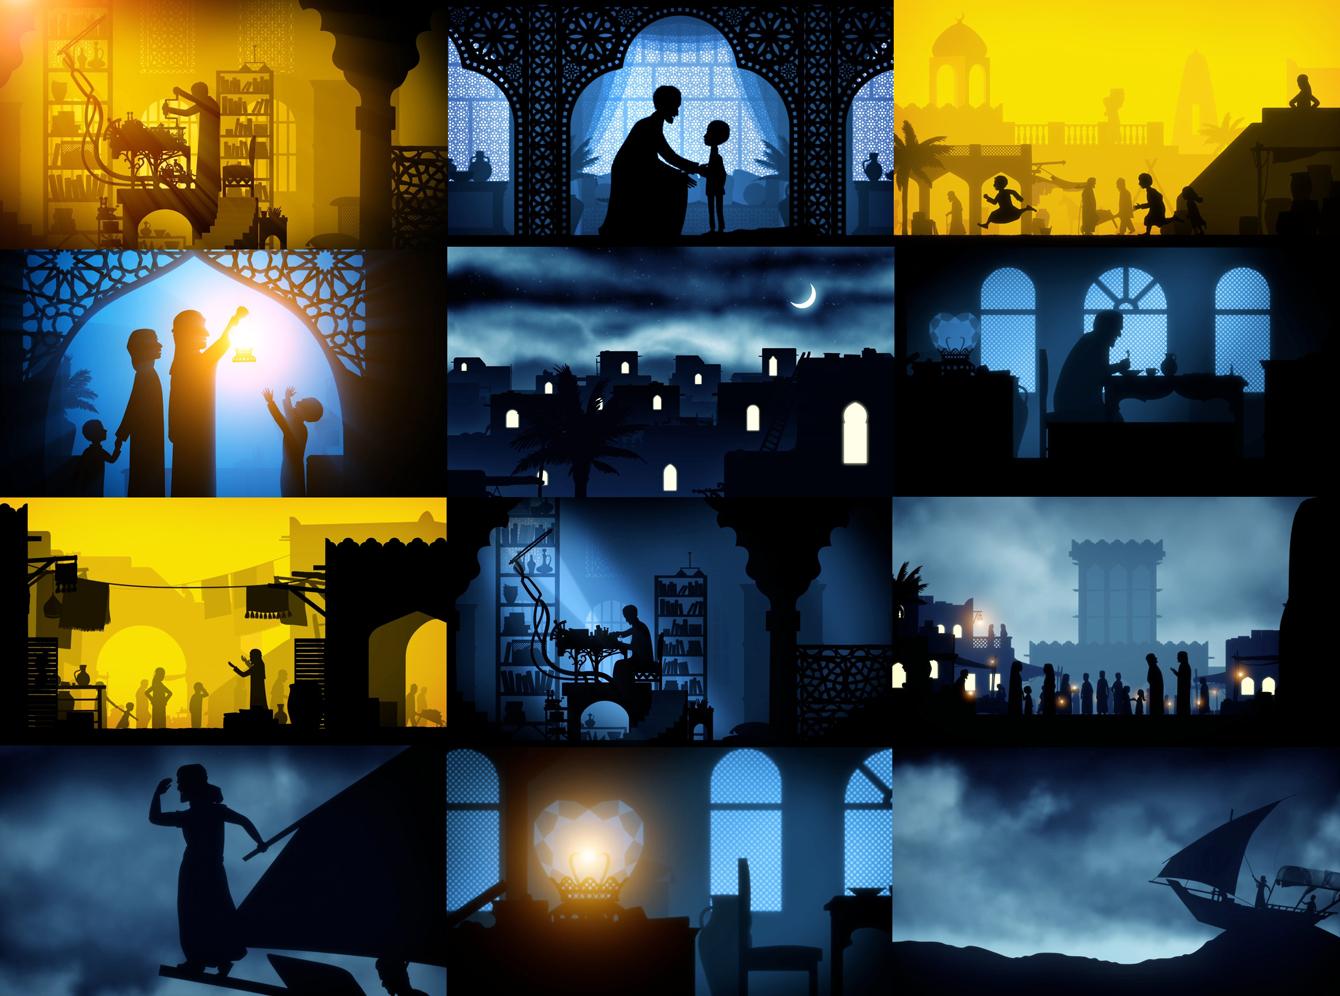 Силуэтная анимация, арабская реклама